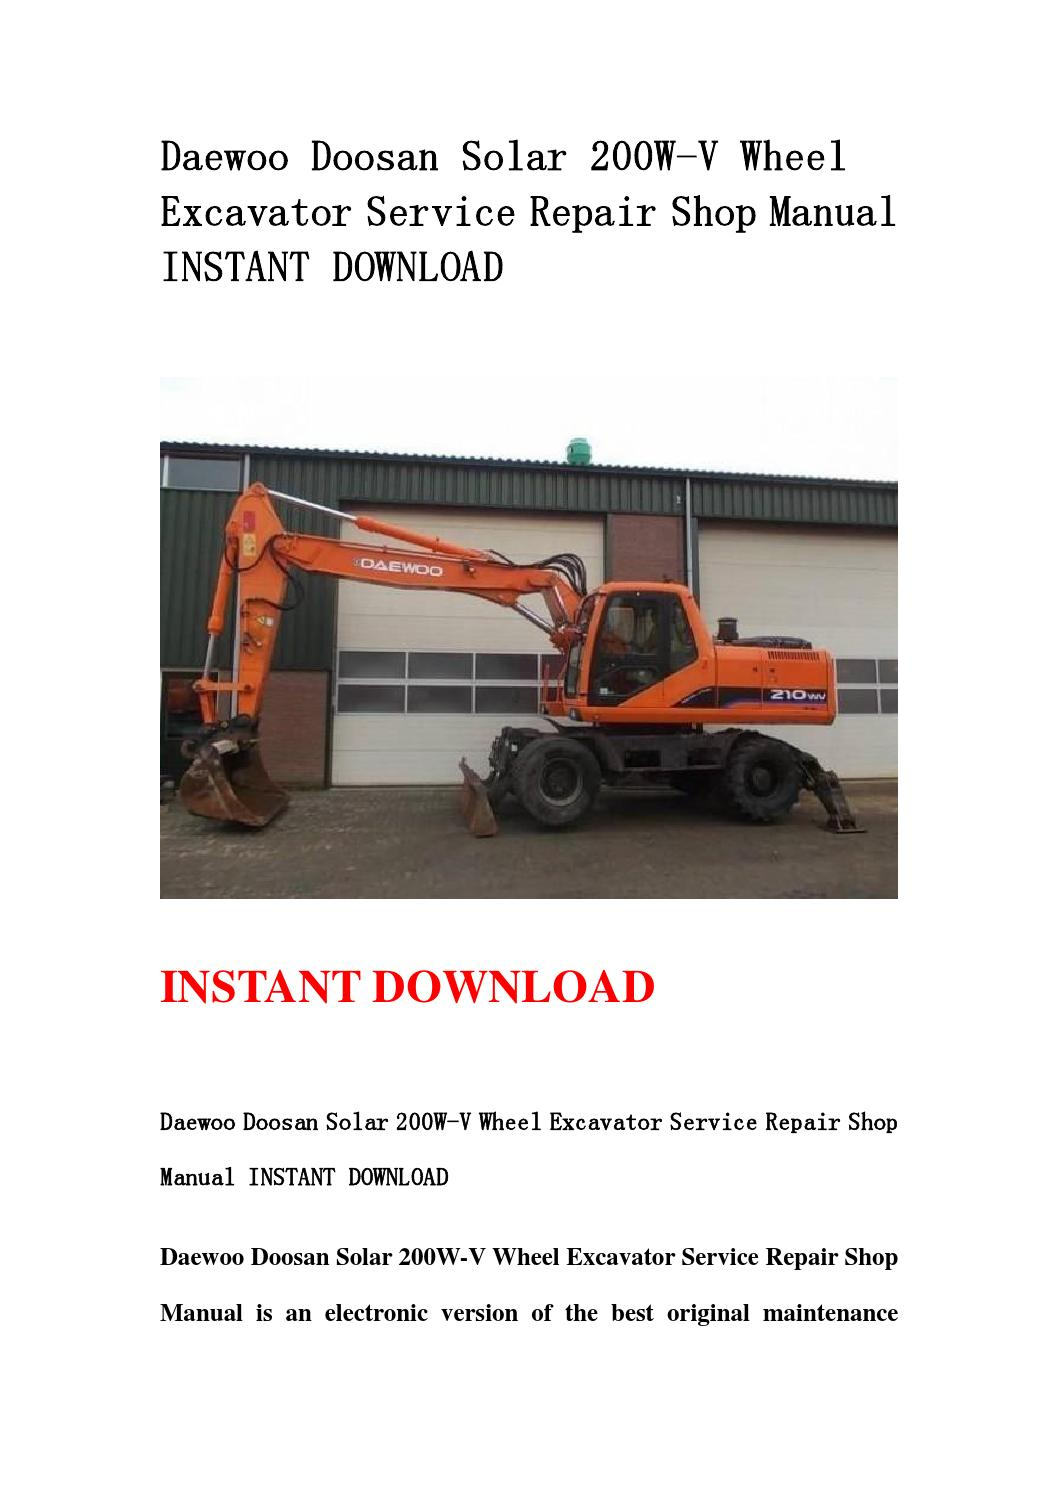 Daewoo doosan solar 200w v wheel excavator service repair shop manual  instant download by kmsjefnef sefjnsehf - issuu